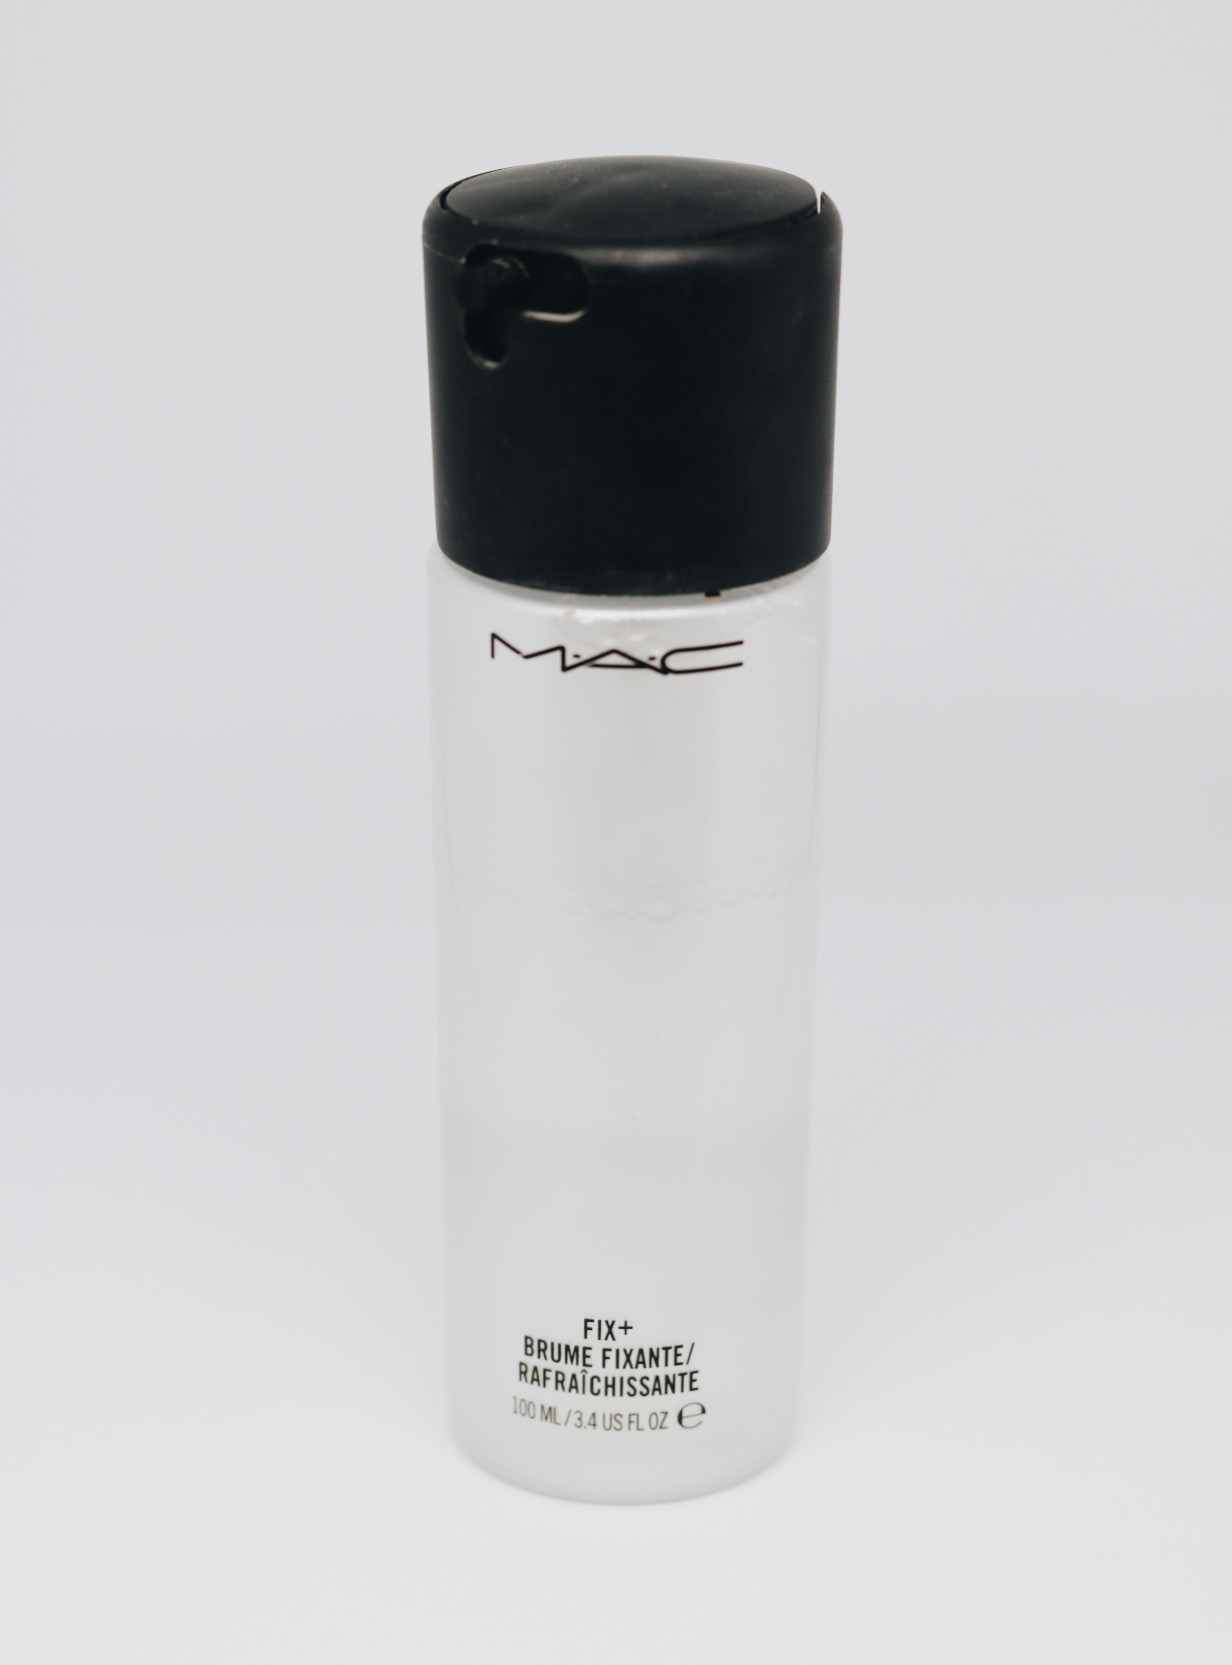 mac fix plus setting spray canadian beauty blogger brittany lauren brittany laurens saskatoon